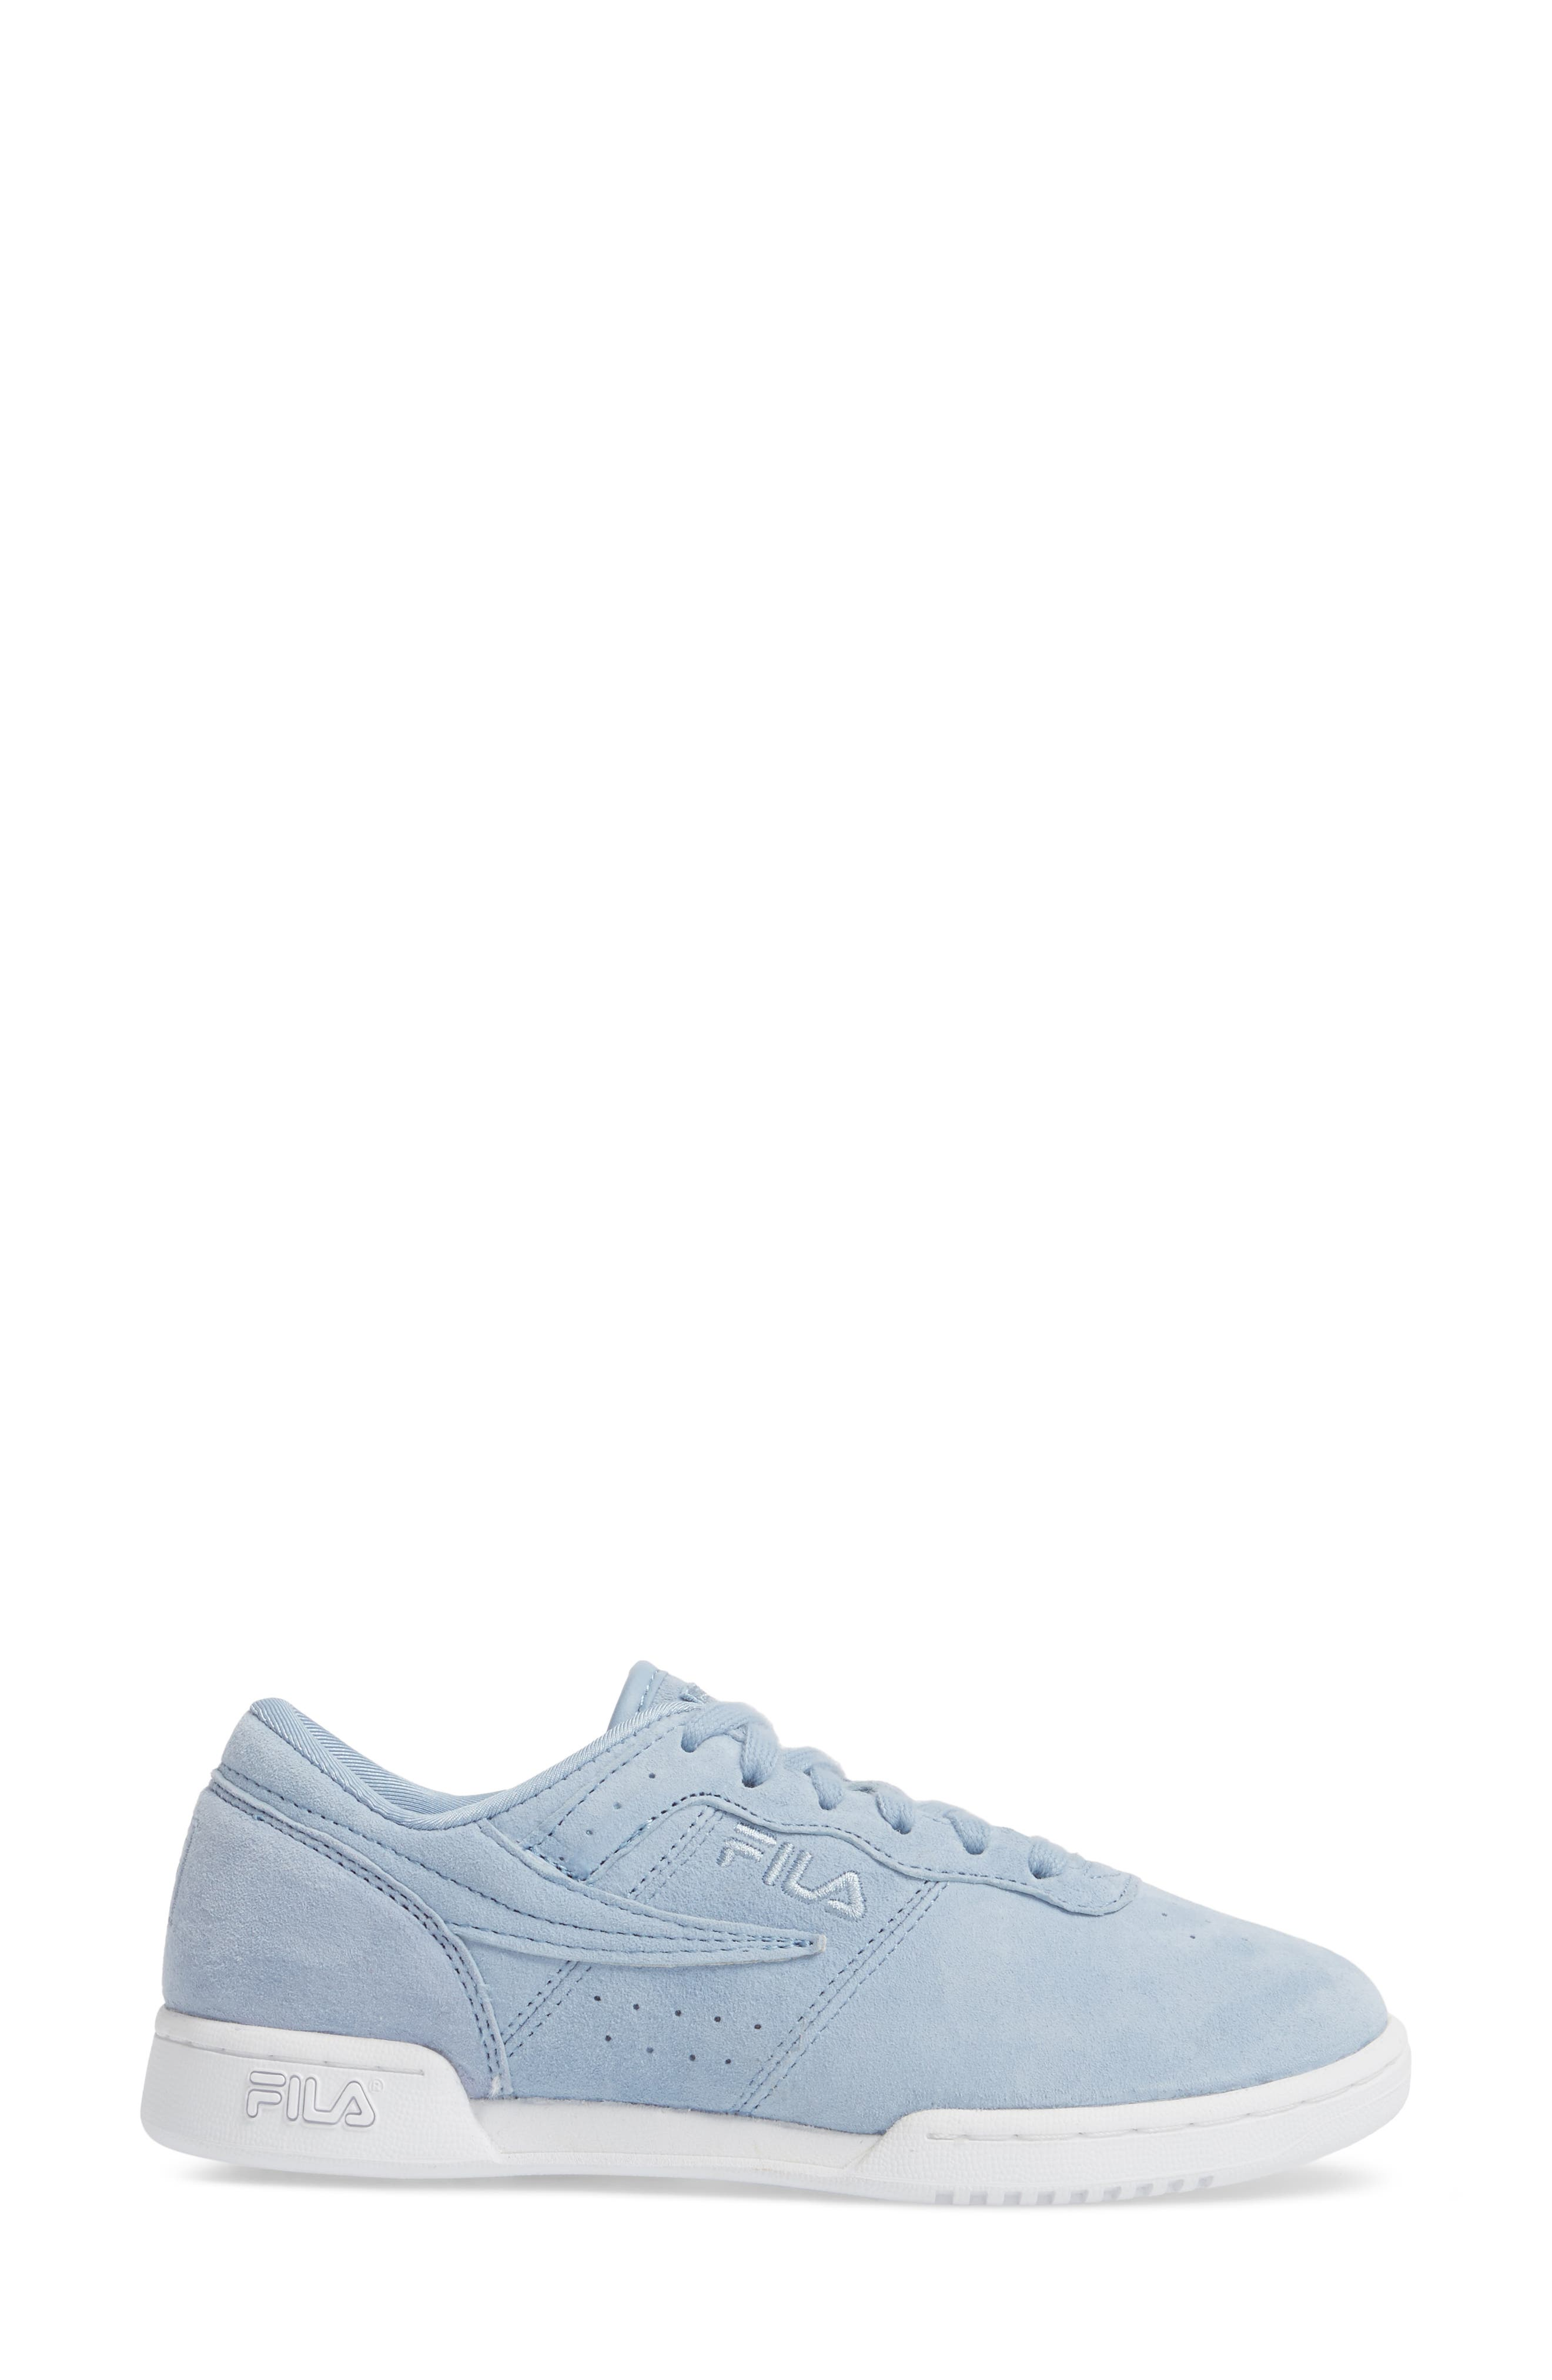 Original Fitness Premium Sneaker,                             Alternate thumbnail 3, color,                             BLUE/ WHITE